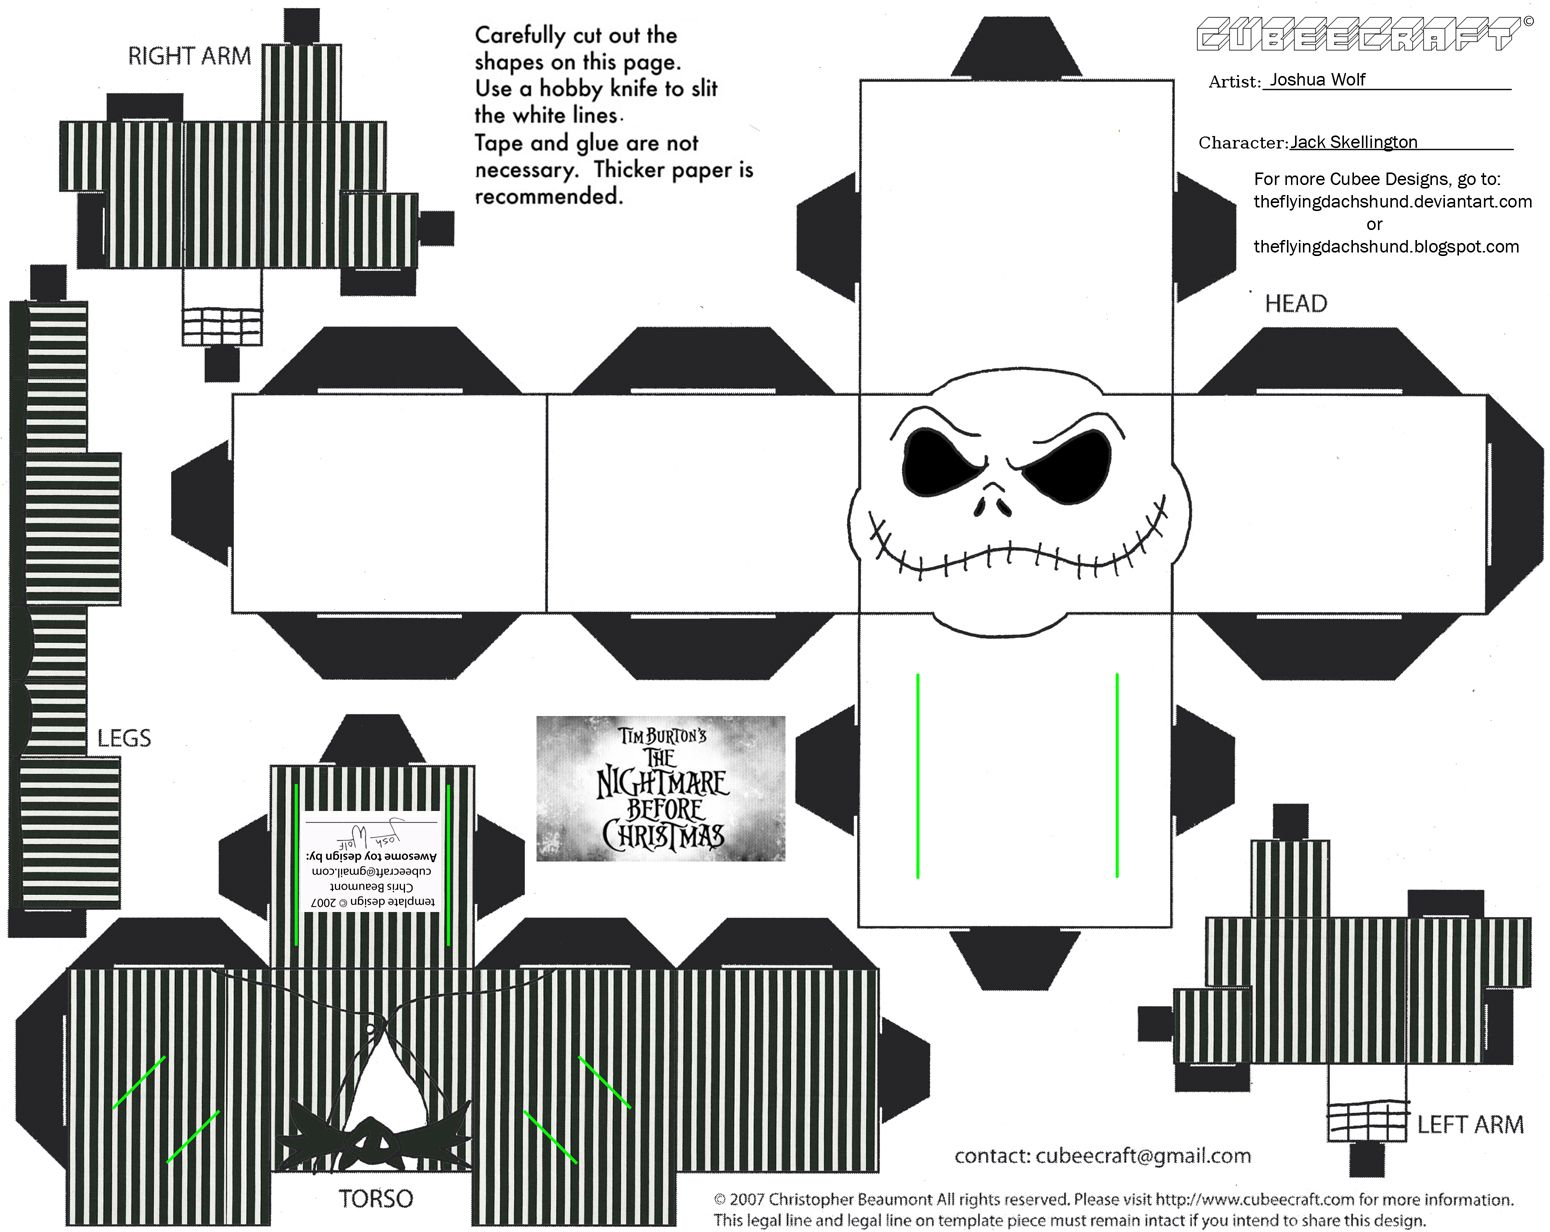 Xmas9 Jack Skellington Cubee By Theflyingdachshundviantart On Deviantart